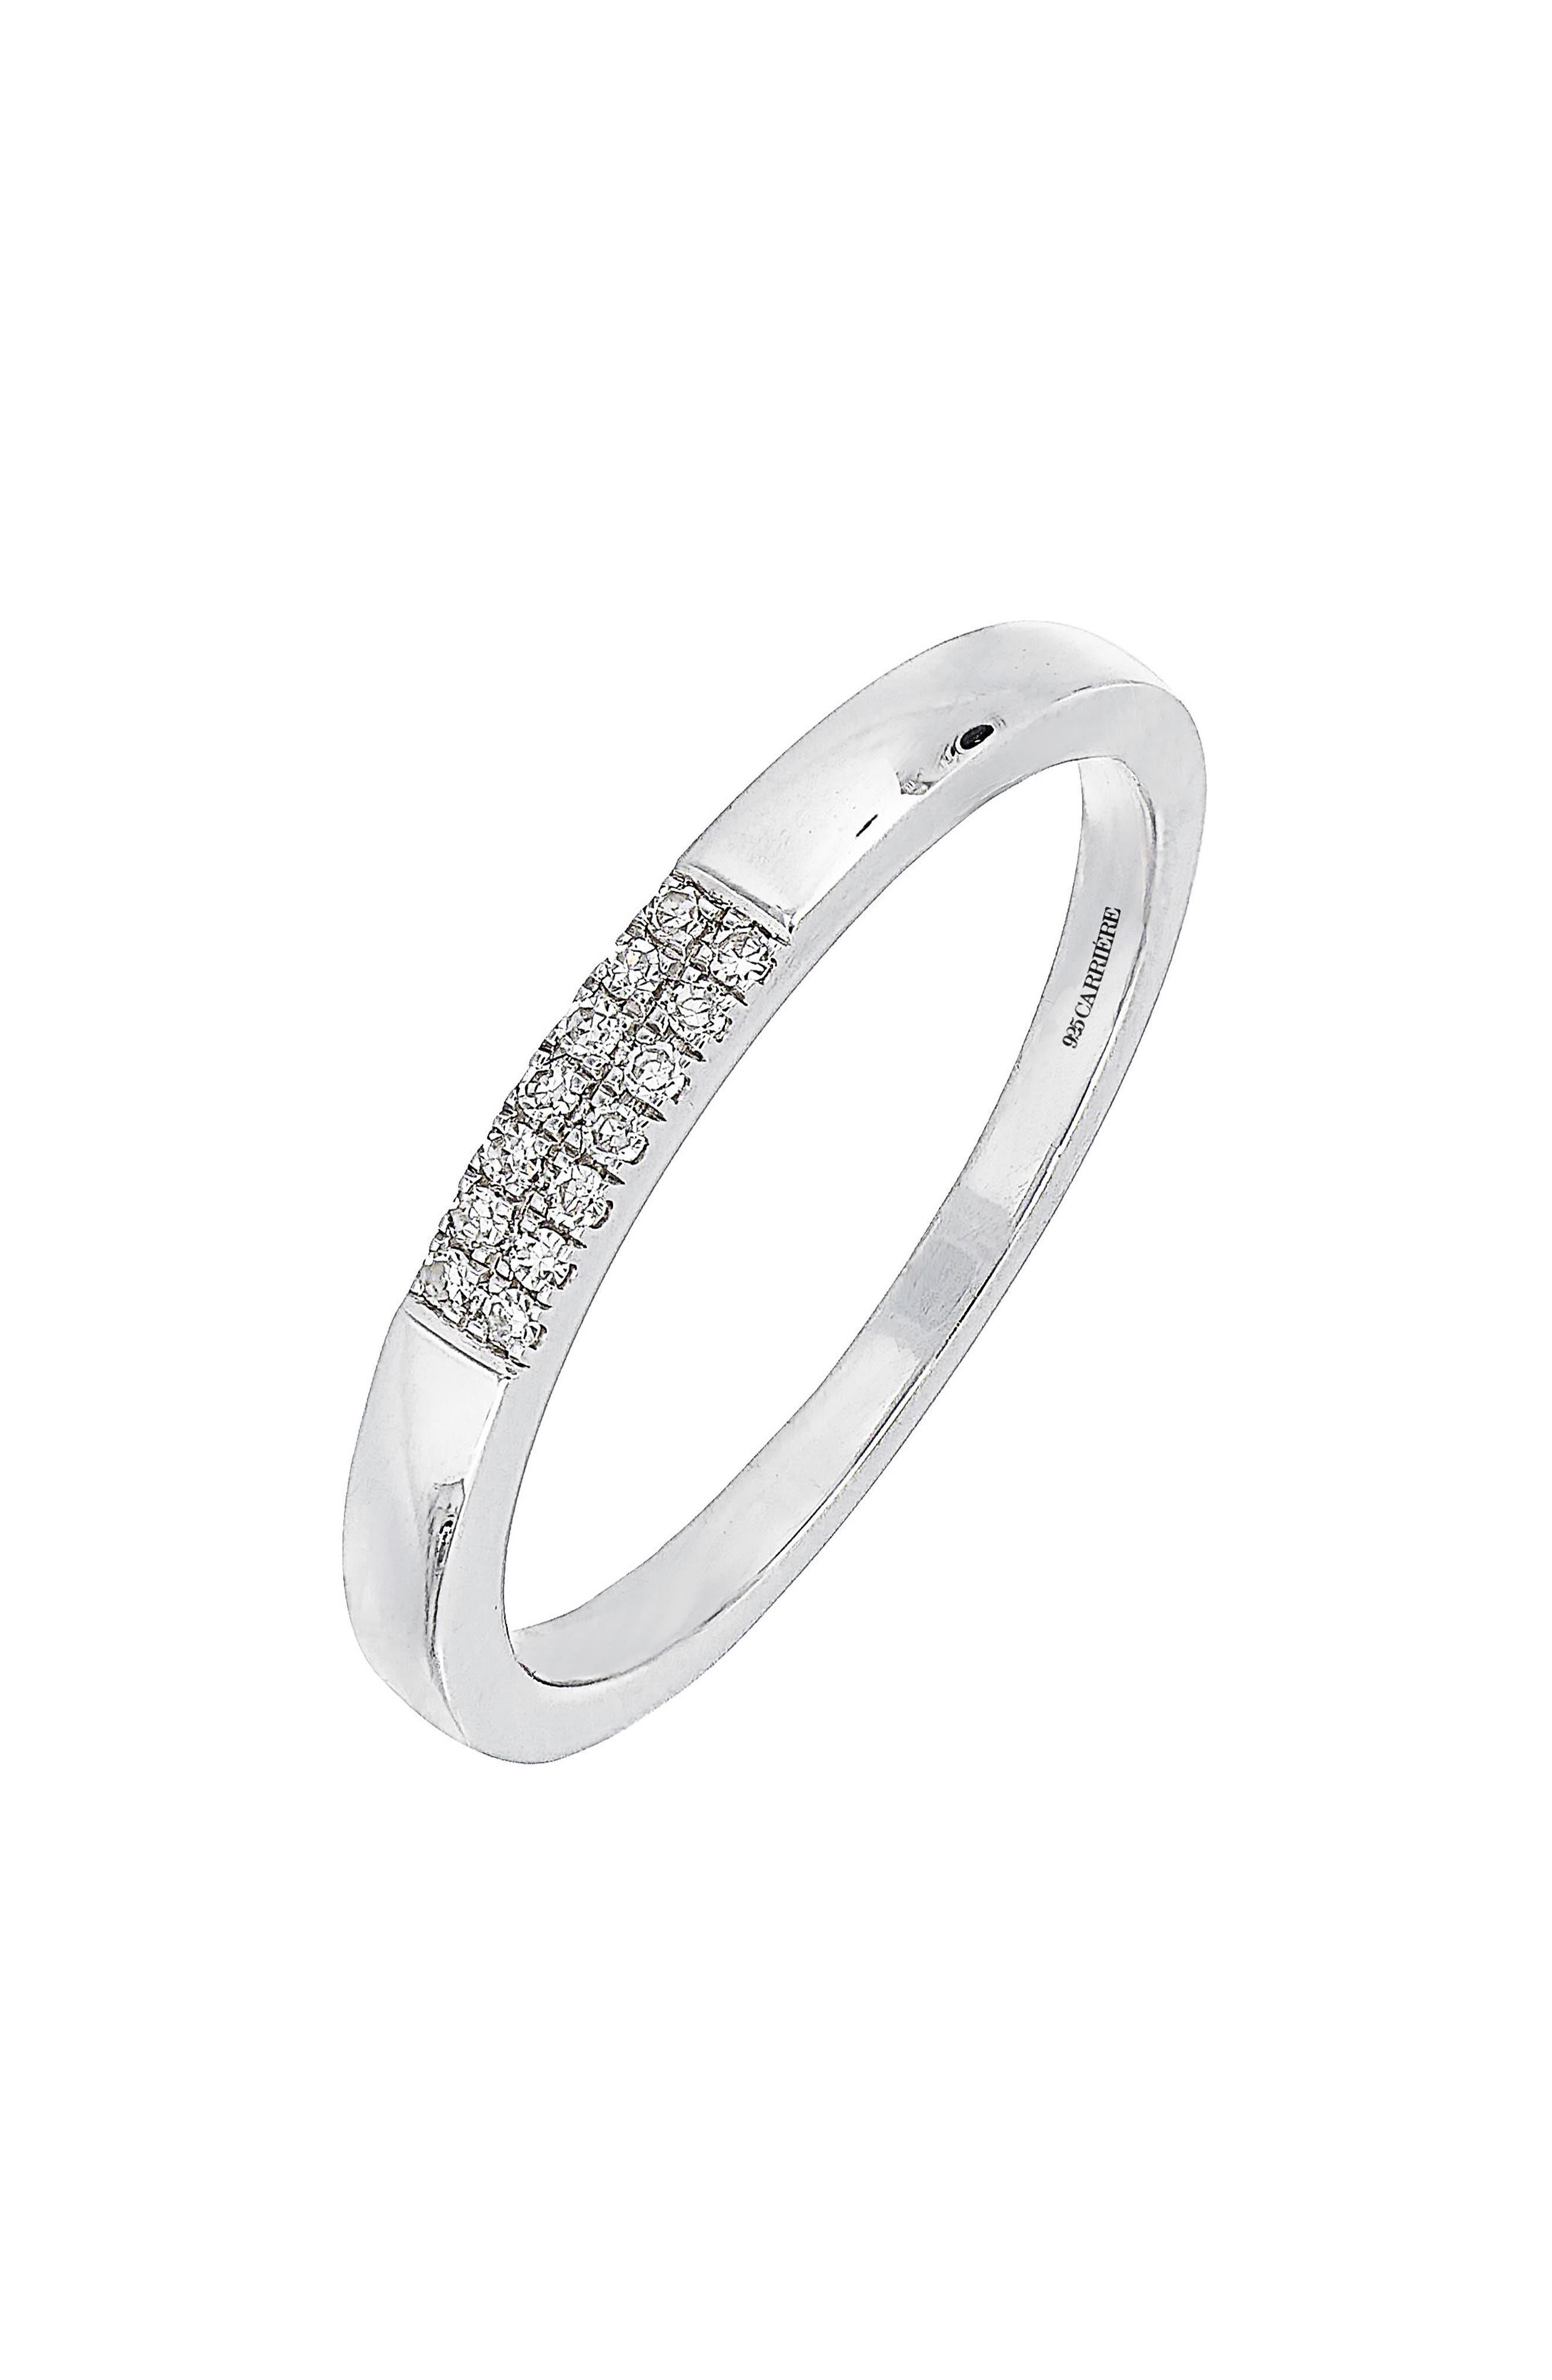 Carrière Diamond Stacking Ring,                             Main thumbnail 1, color,                             Silver/ Diamond